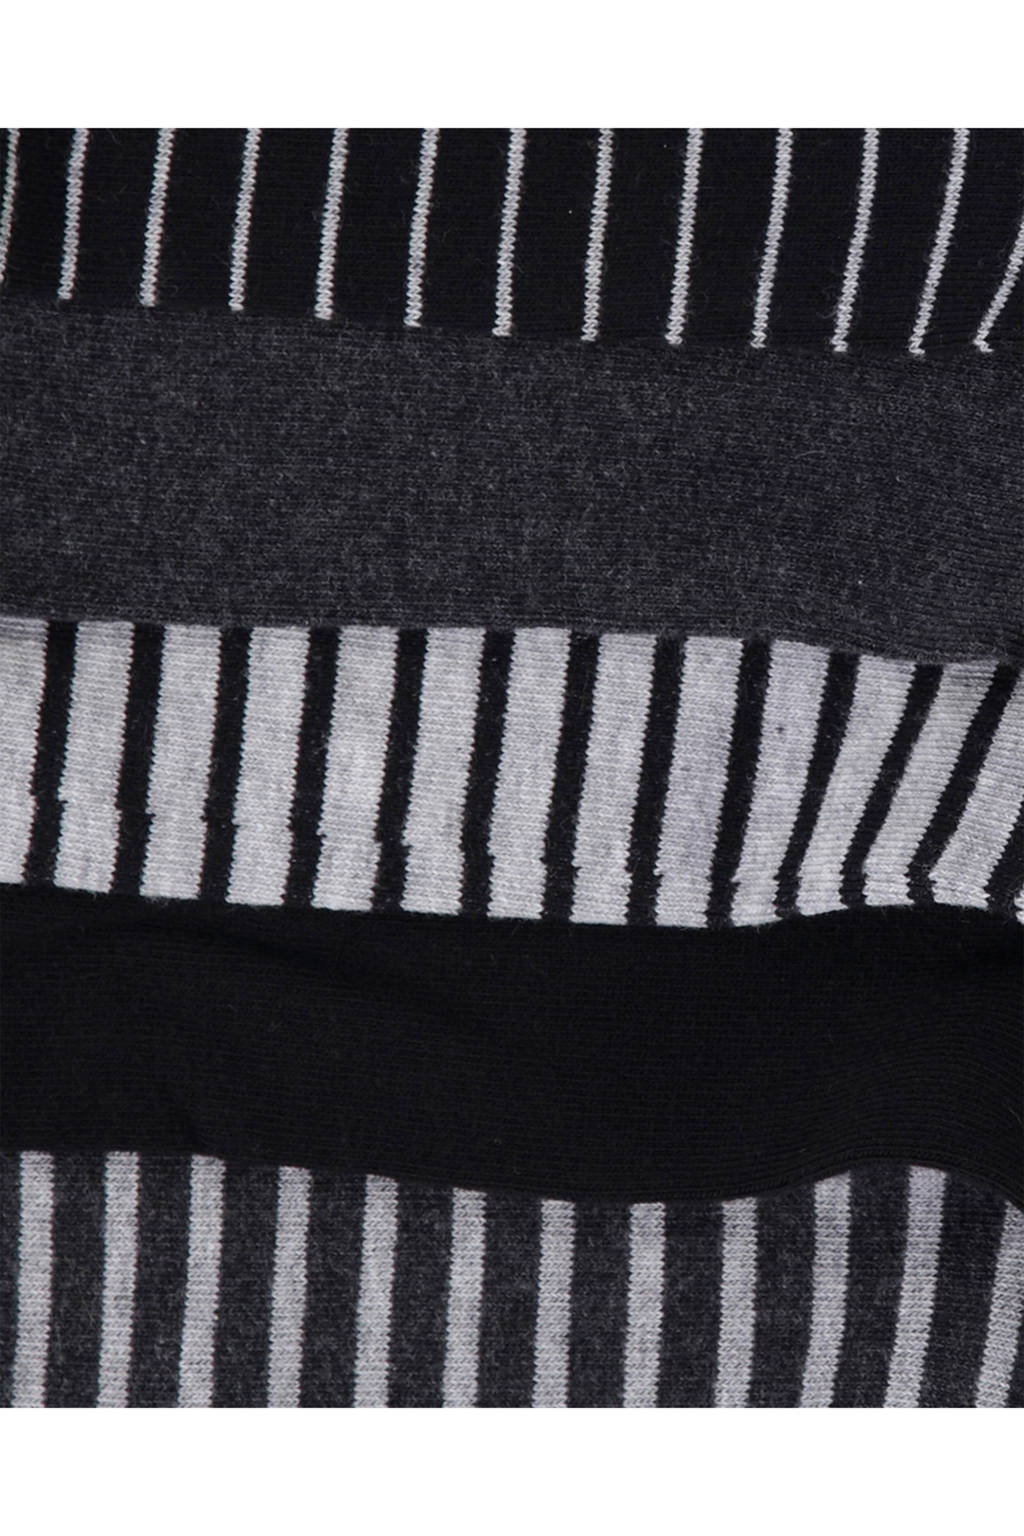 WE Fashion Fundamental sokken - set van 5, Grijs/zwart